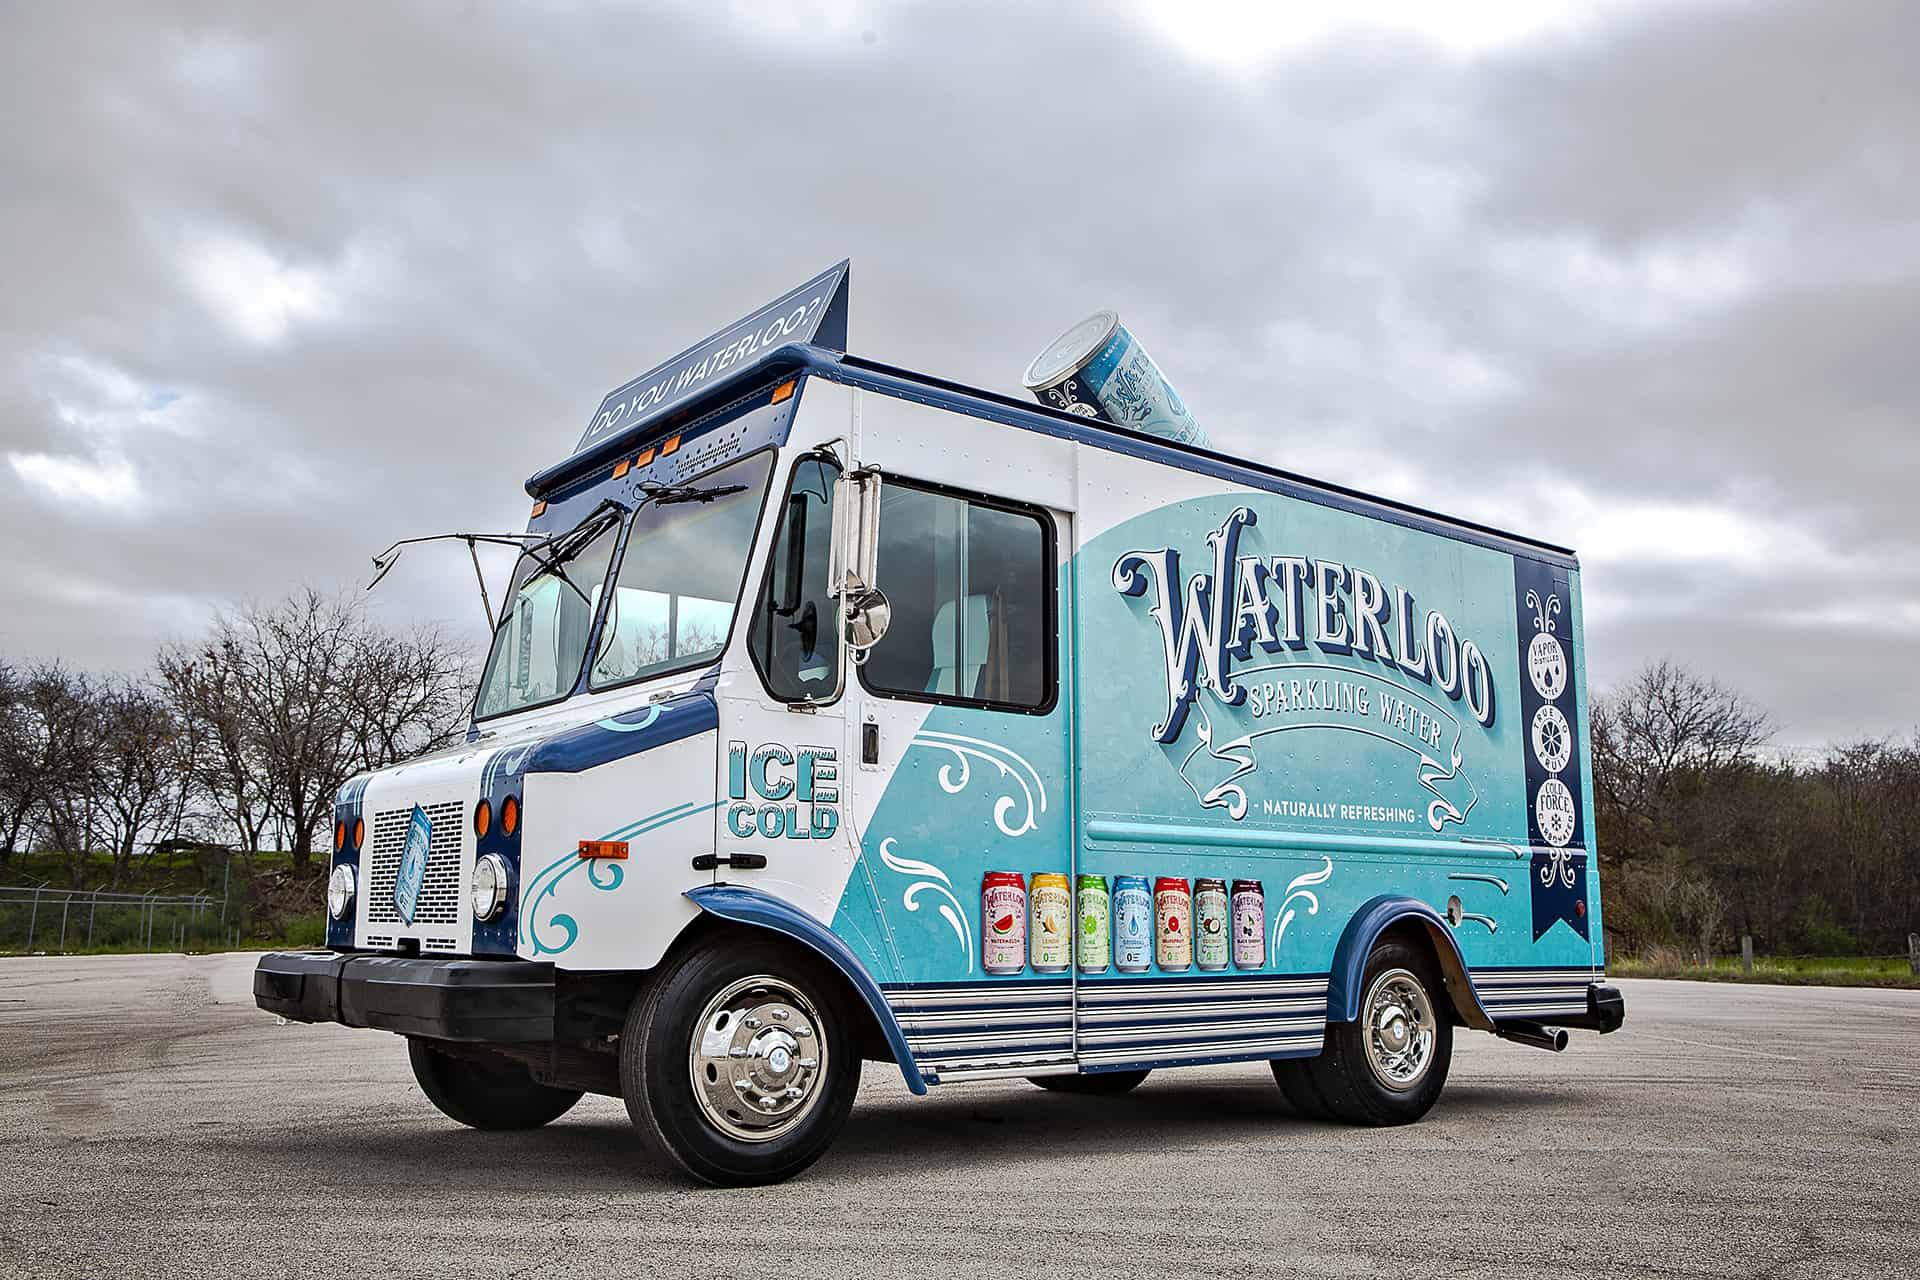 Custom Food Truck   Waterloo Sparkling Water Food Truck Exterior